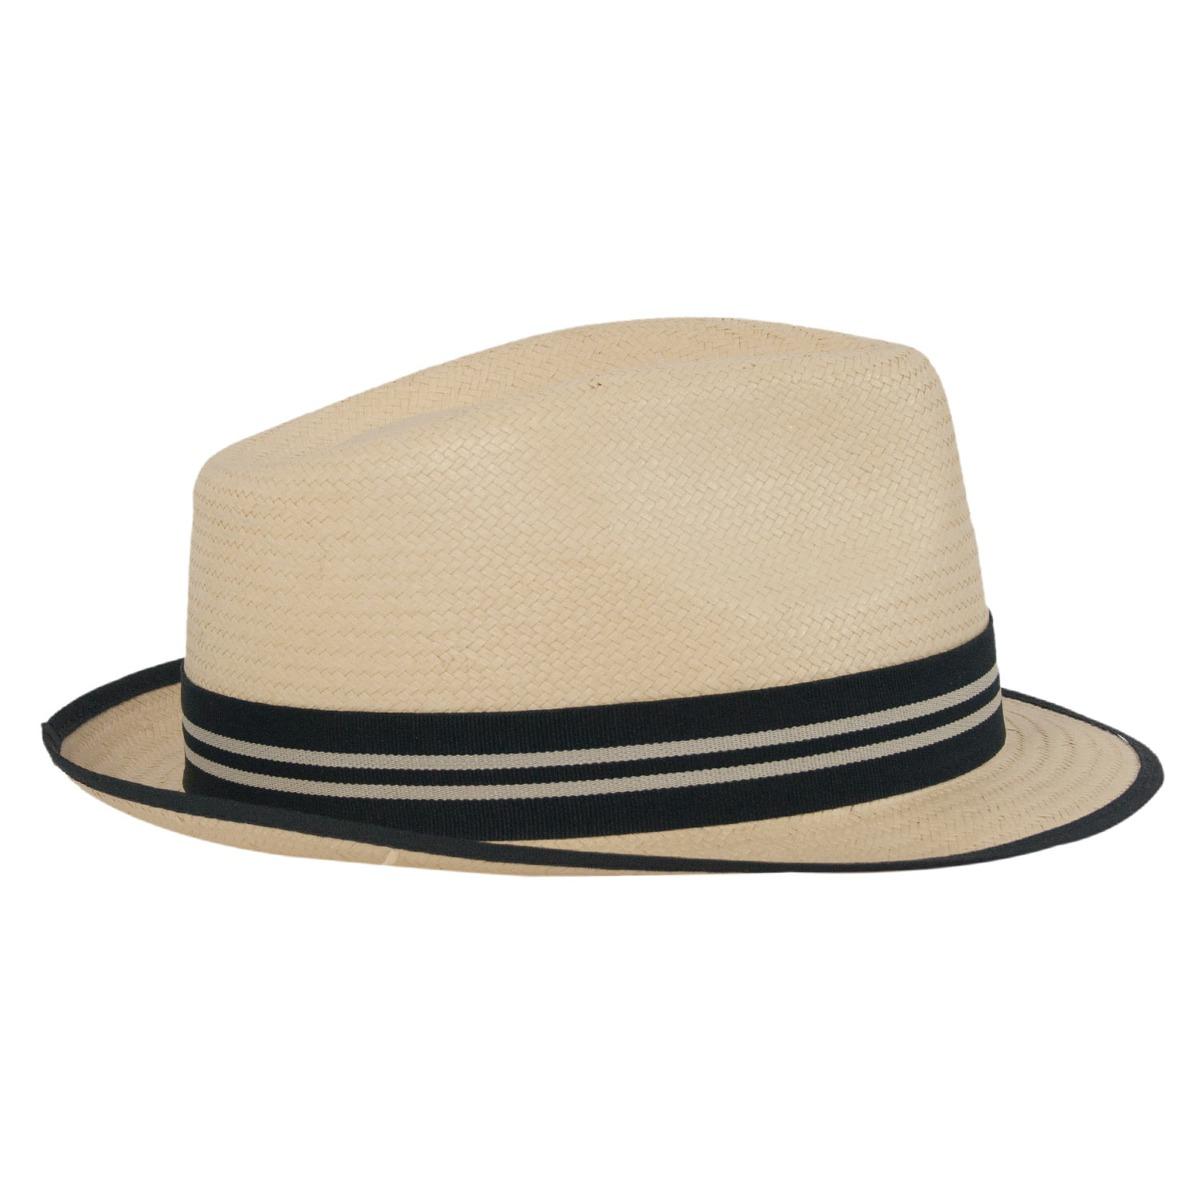 ba6df388670a1 chapéu trilby unissex estilo palha aba curta todos os tamanh. Carregando  zoom.